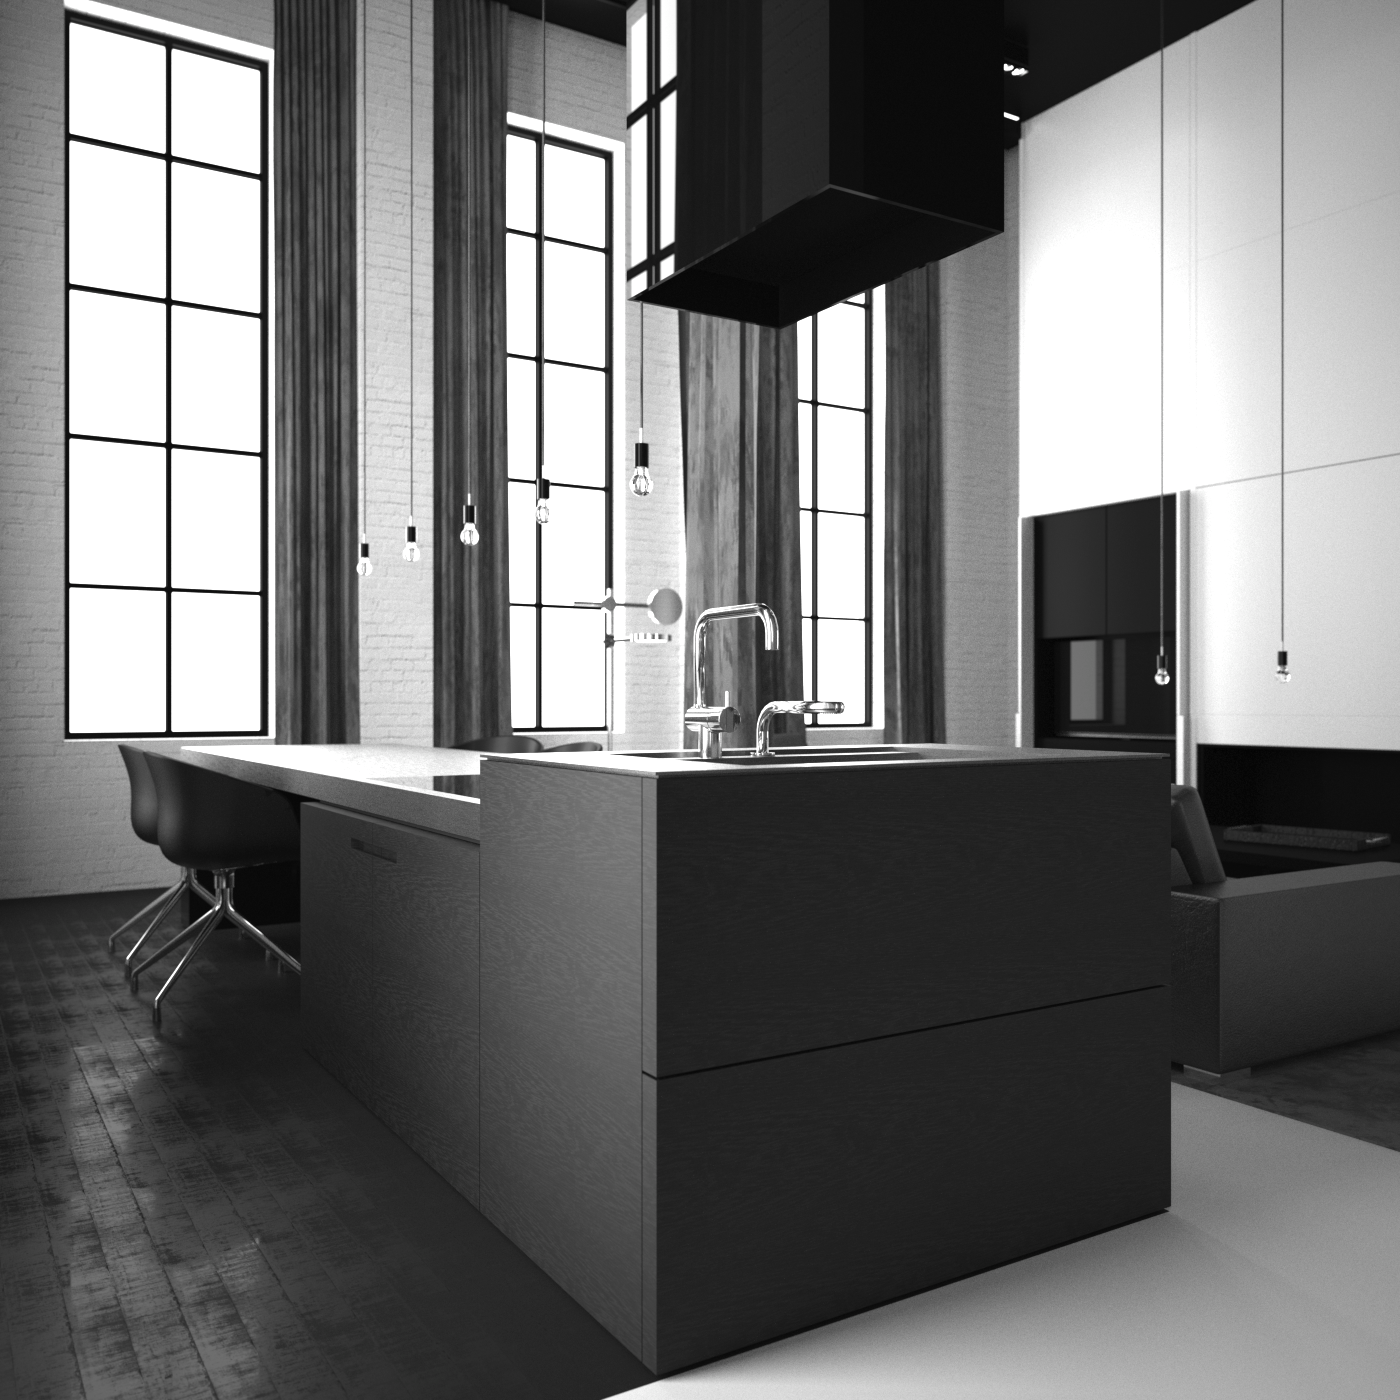 Keuken  Interior design  Pinterest